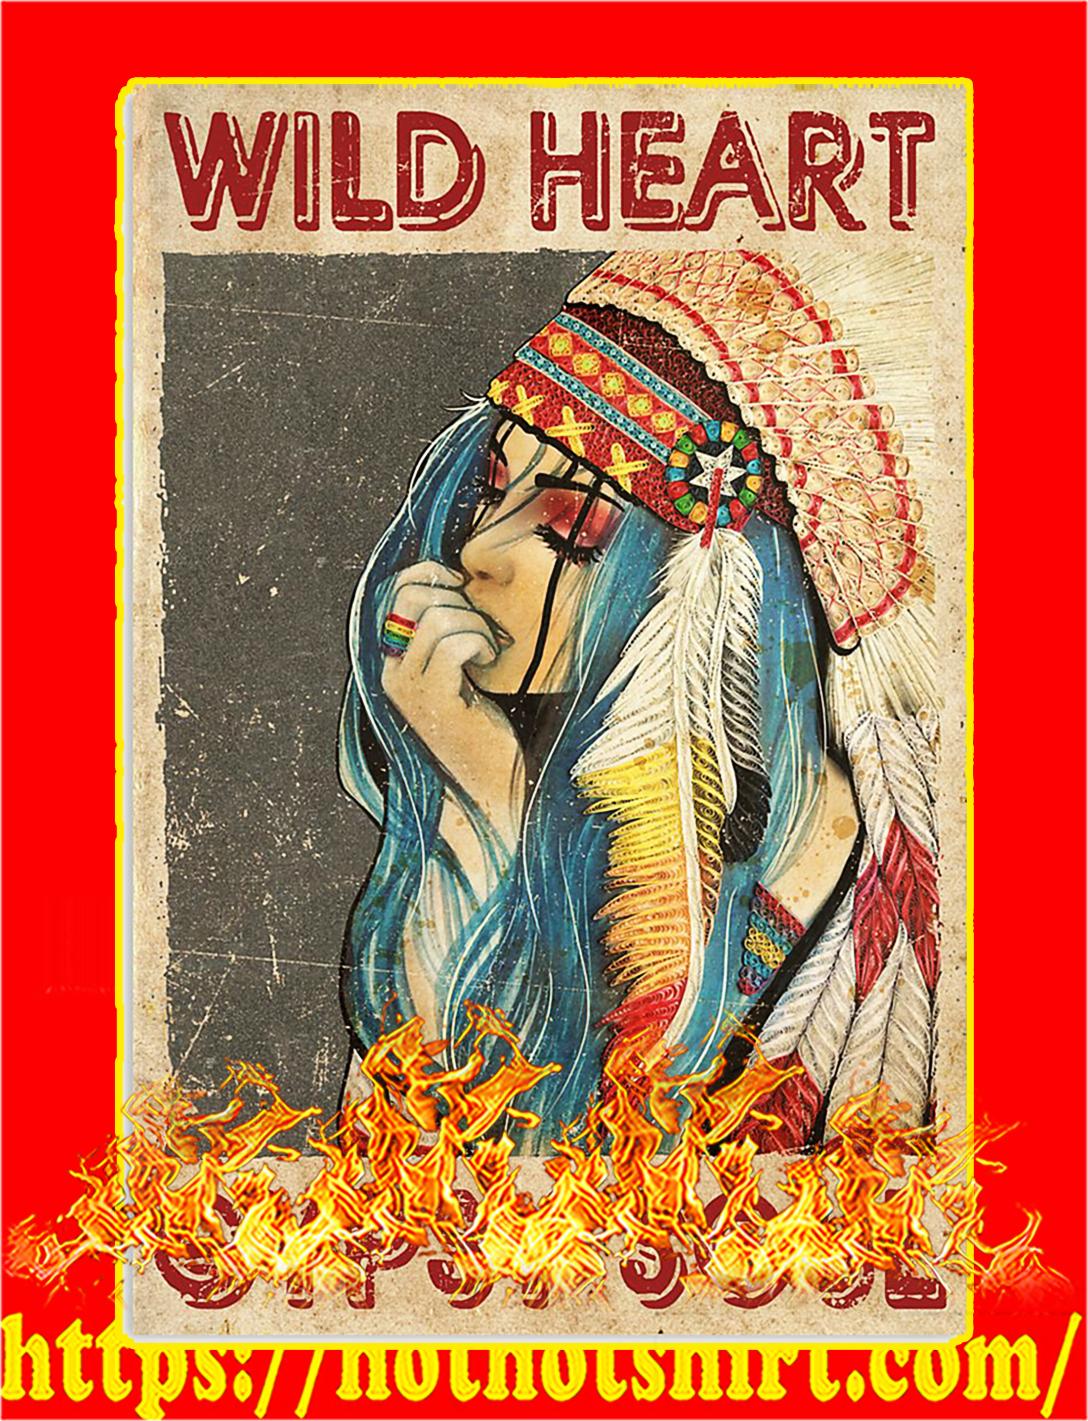 Wild heart gypsy soul poster - A2